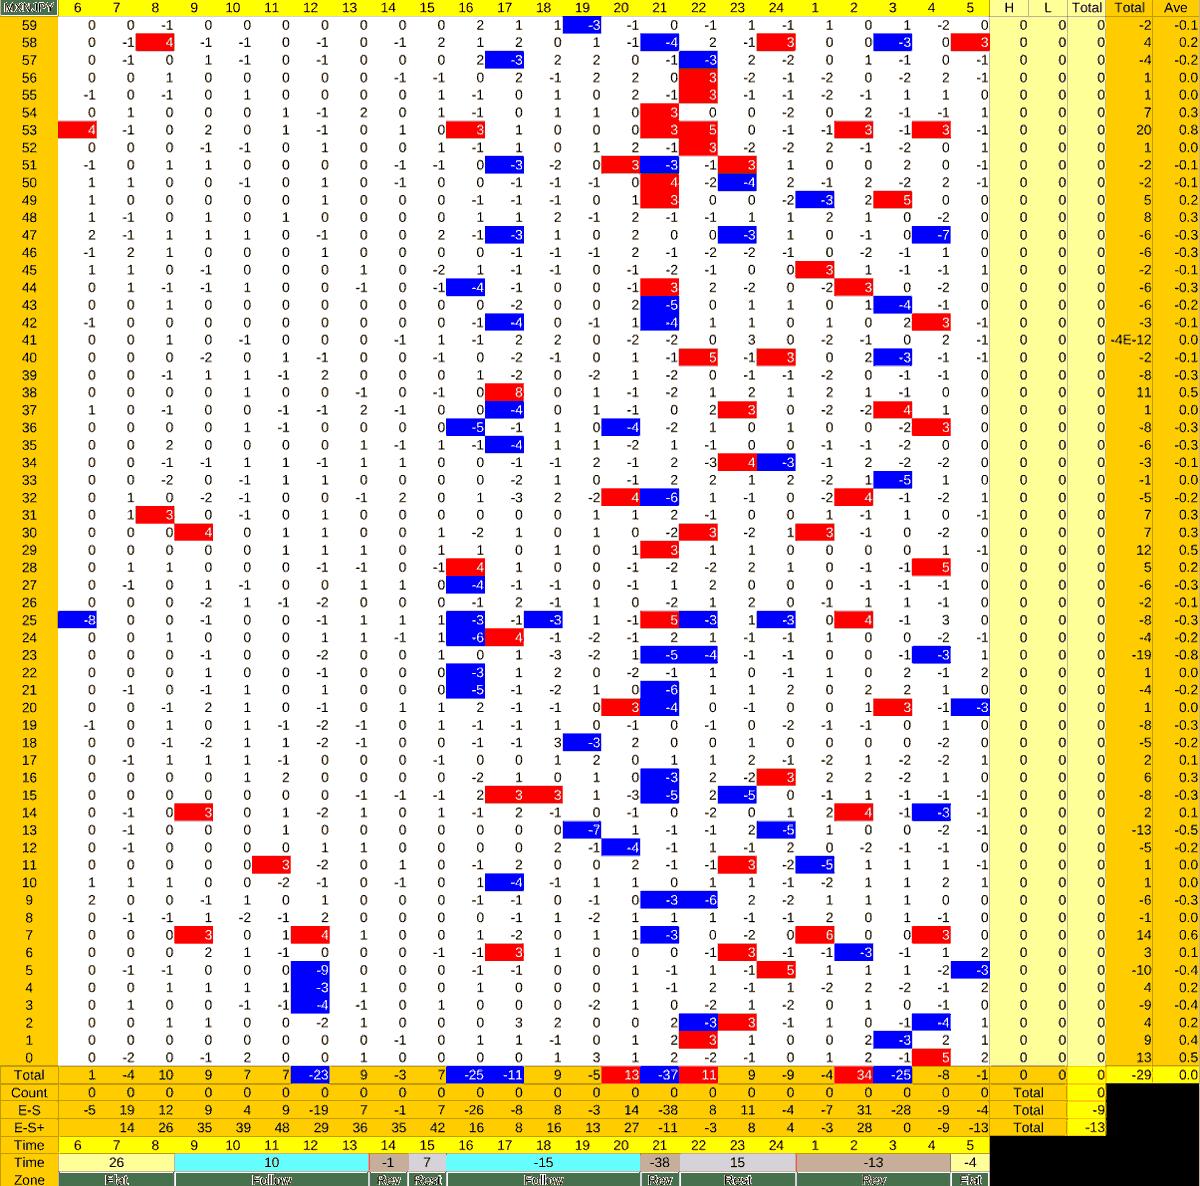 20210318_HS(3)MXNJPY